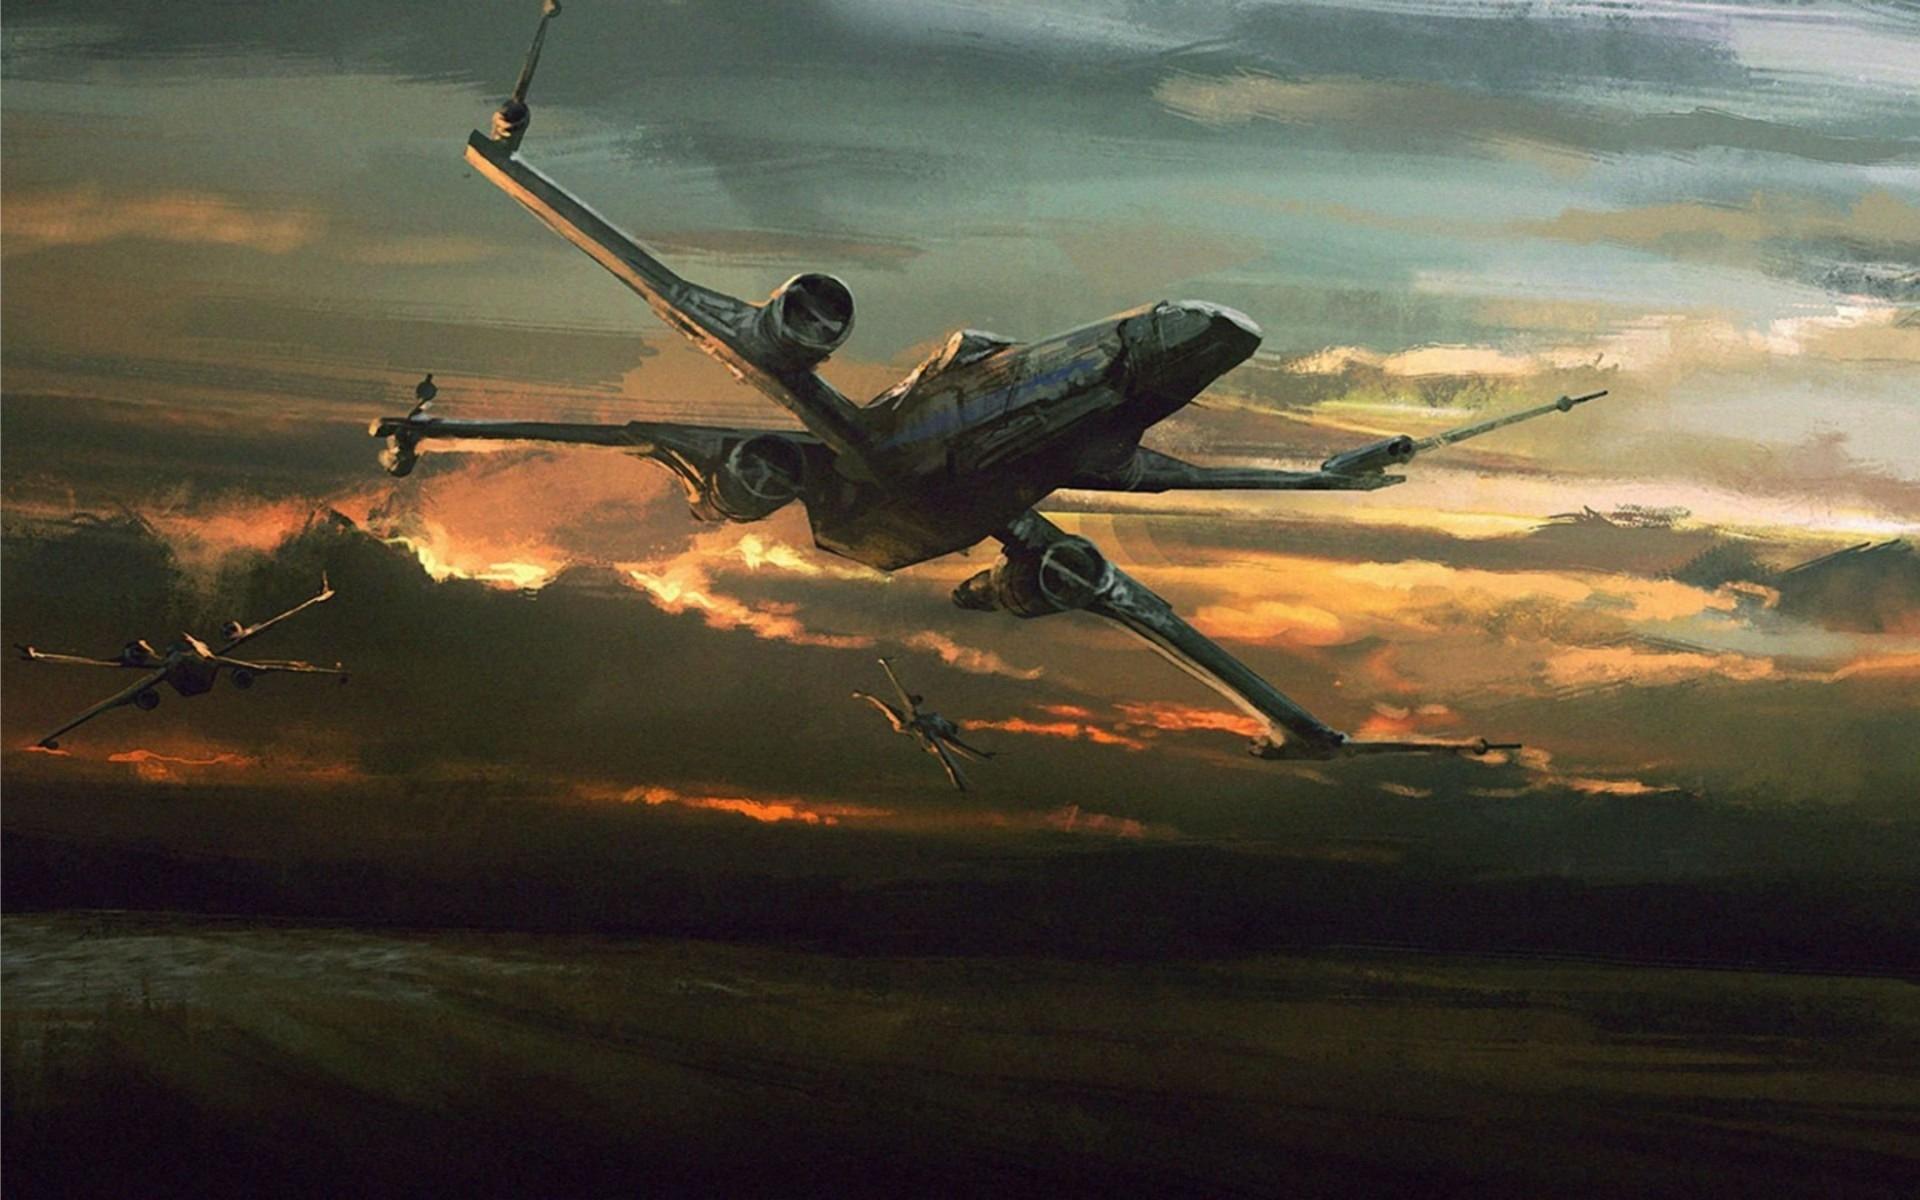 Best X-Wing Fighter Star Wars The Force Awakens 4K Wallpaper